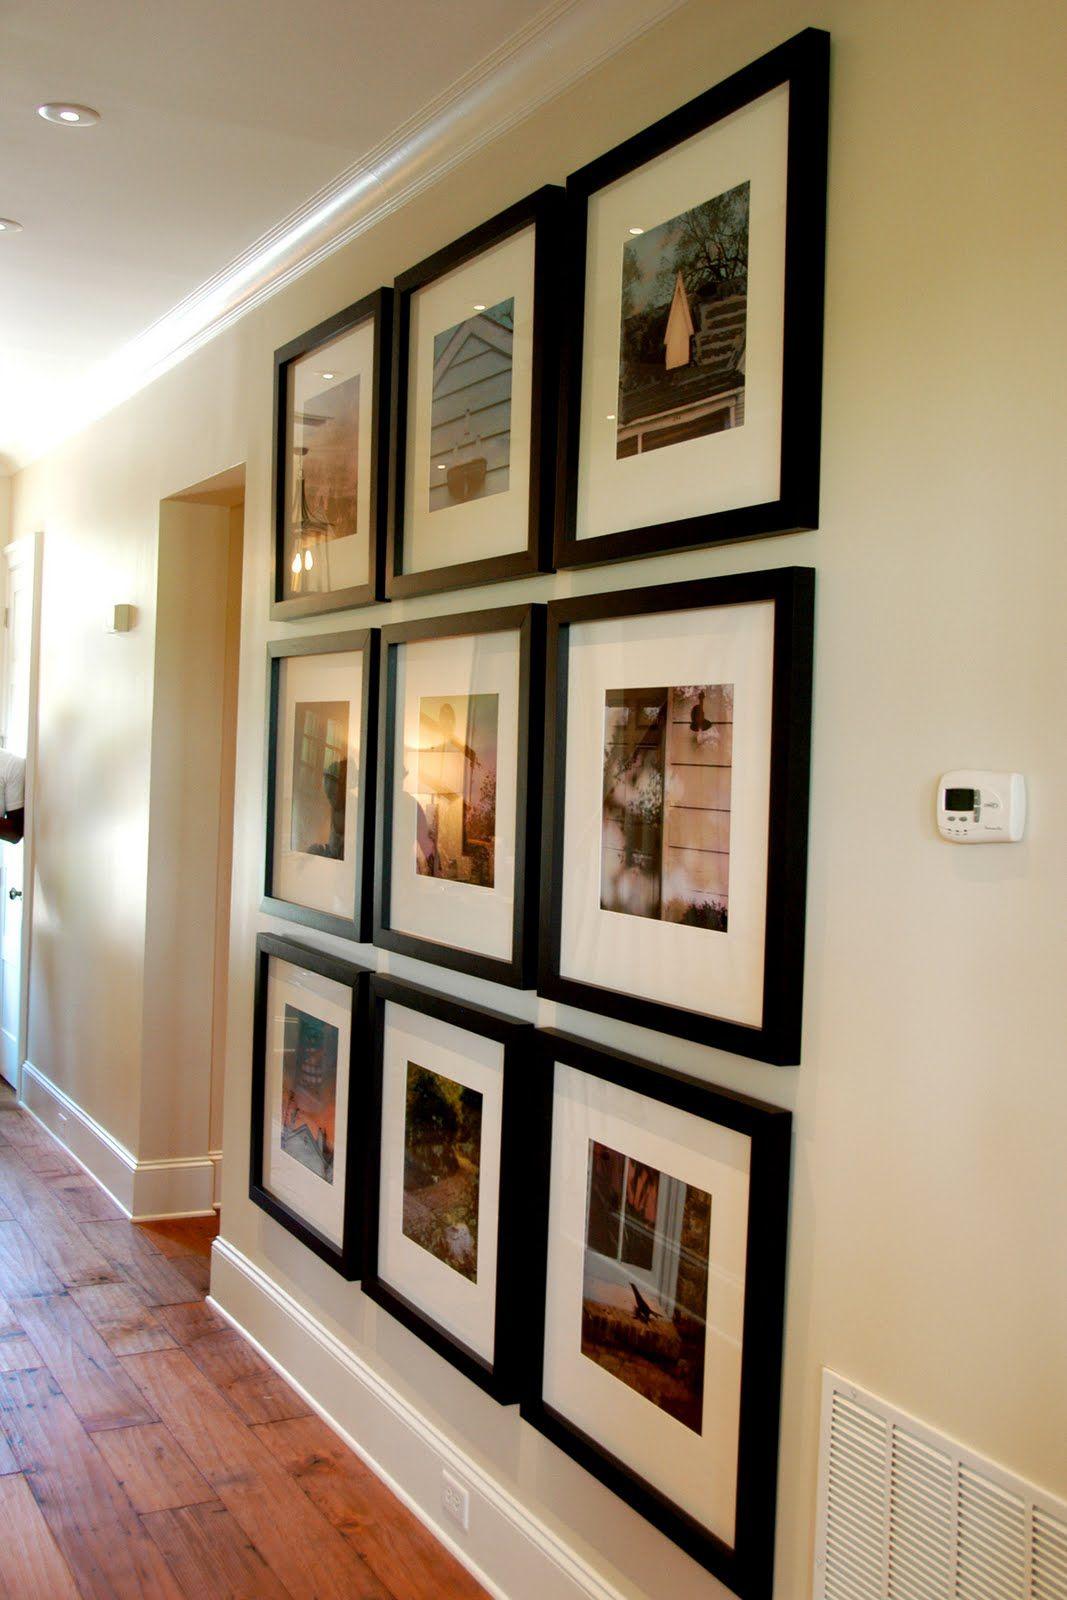 Frame Photograph Arrangement Ideas The Polkadot Chair Home